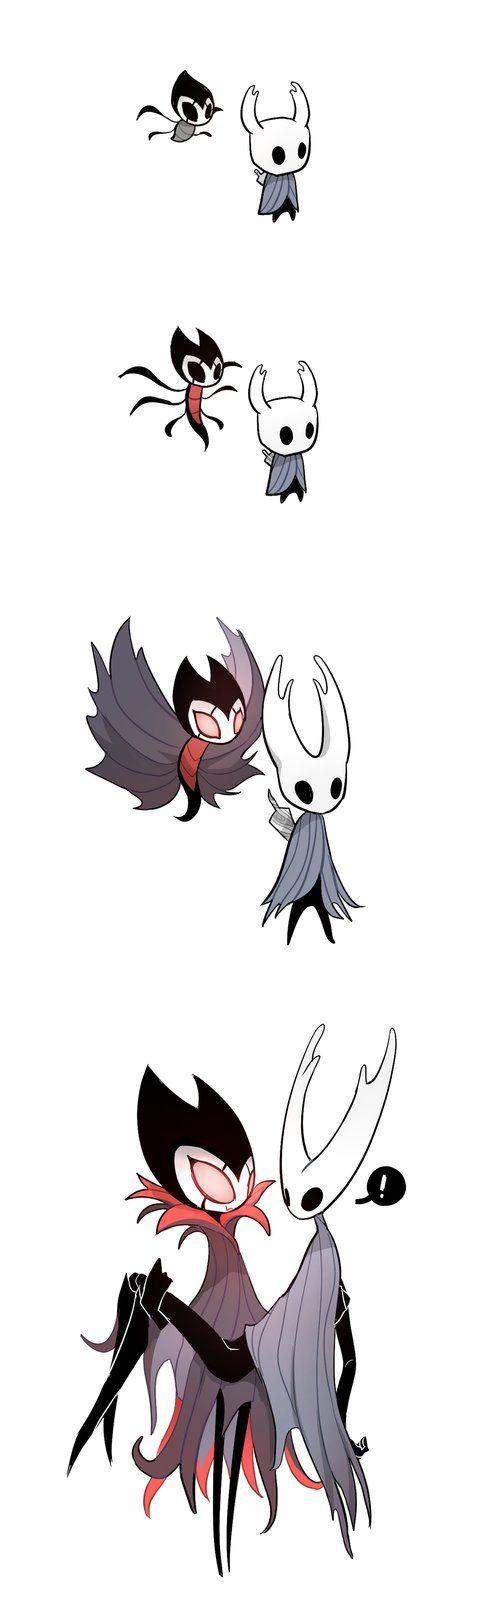 Hollow Knight Sketches 3 Weasyl